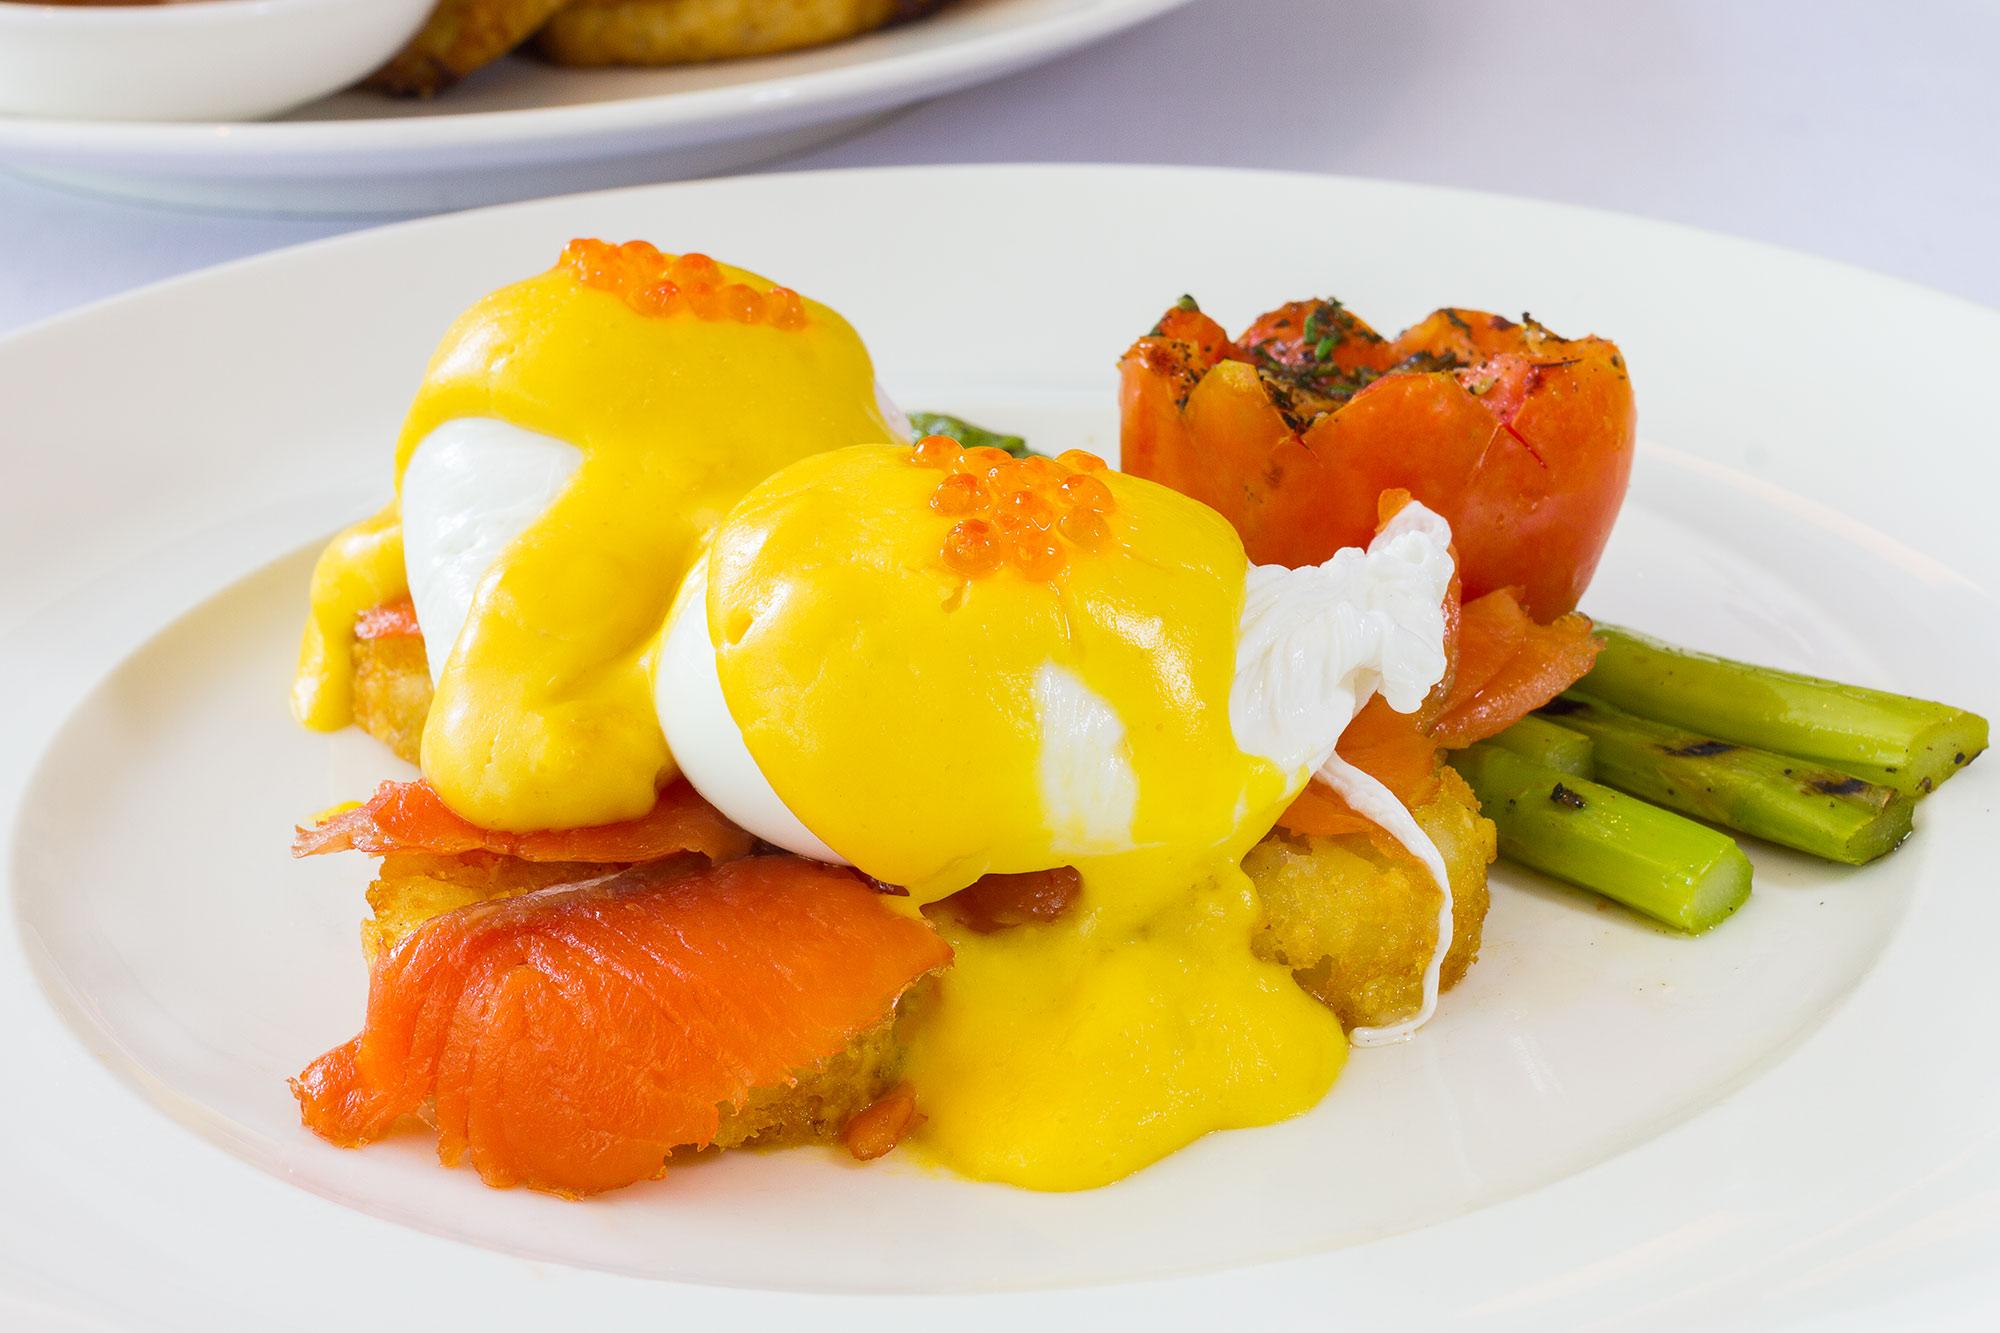 Norwegian Egg Benedict  Cafe Claire คาเฟ่แคลร์ โรงแรมโอเรียนเต็ล เรสซิเดนซ์ กรุงเทพฯ Eggs Norwegian